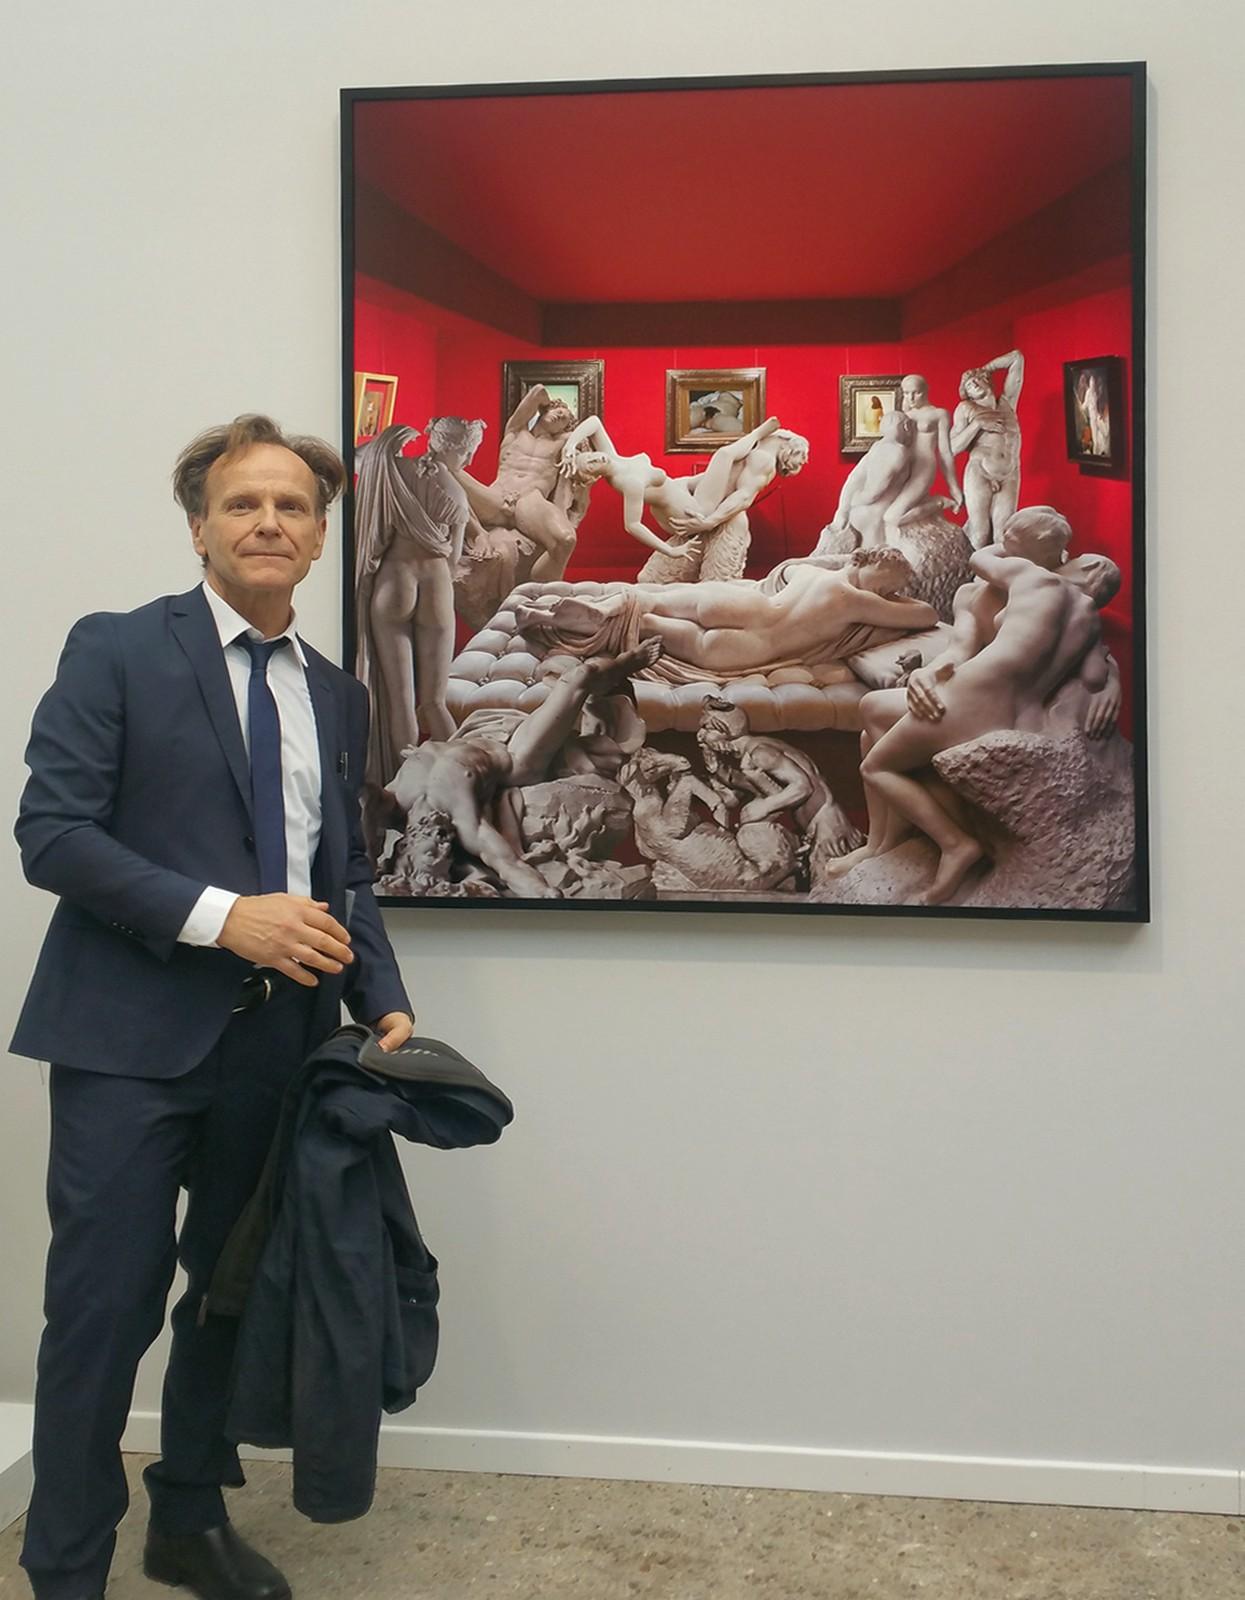 erotic photo art boulogne billancourt